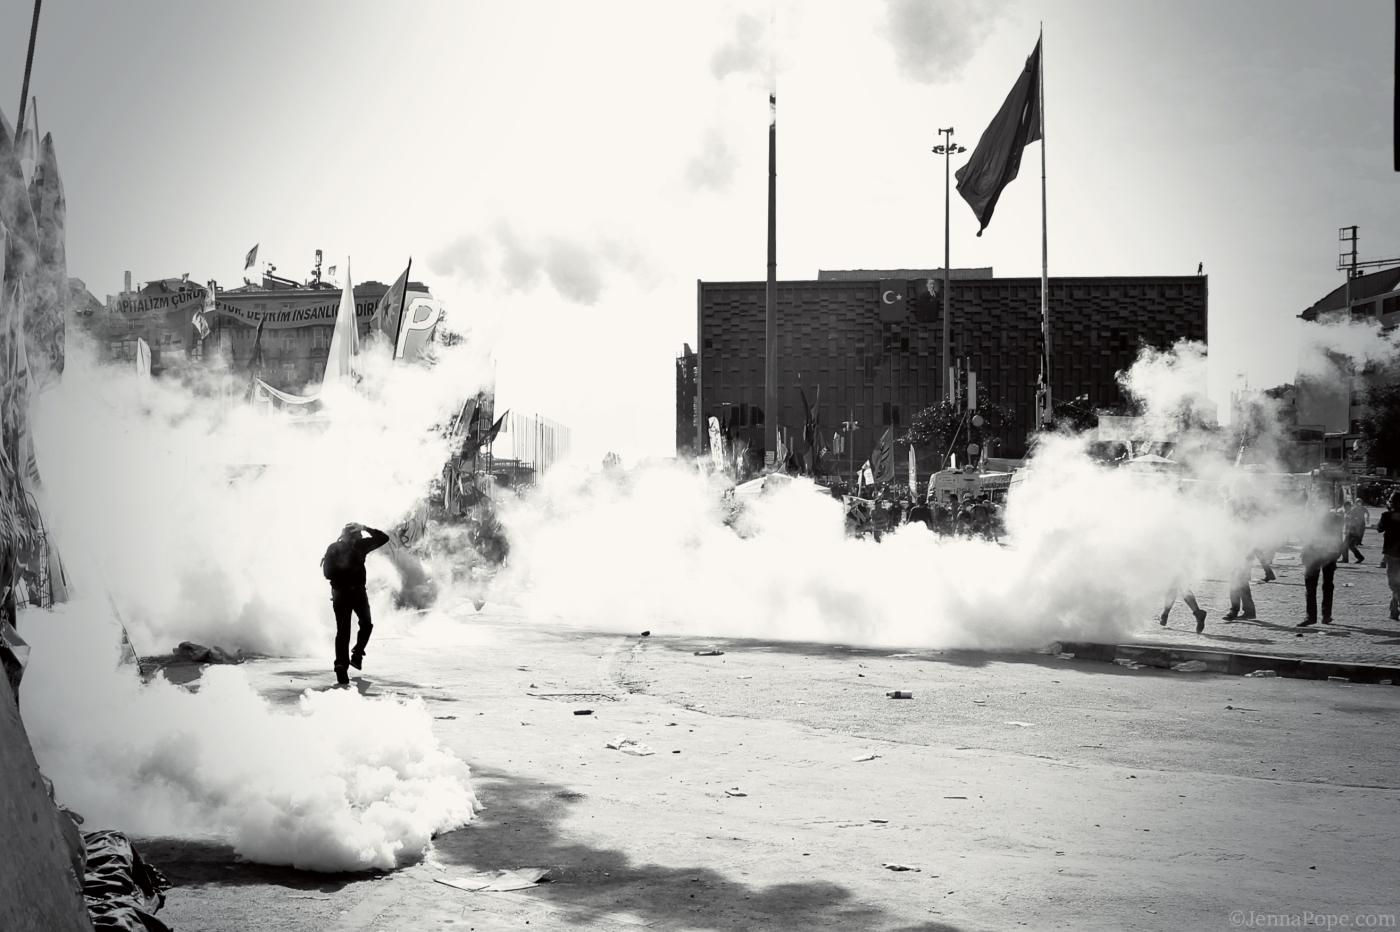 Tear gas filling Taksim Square.